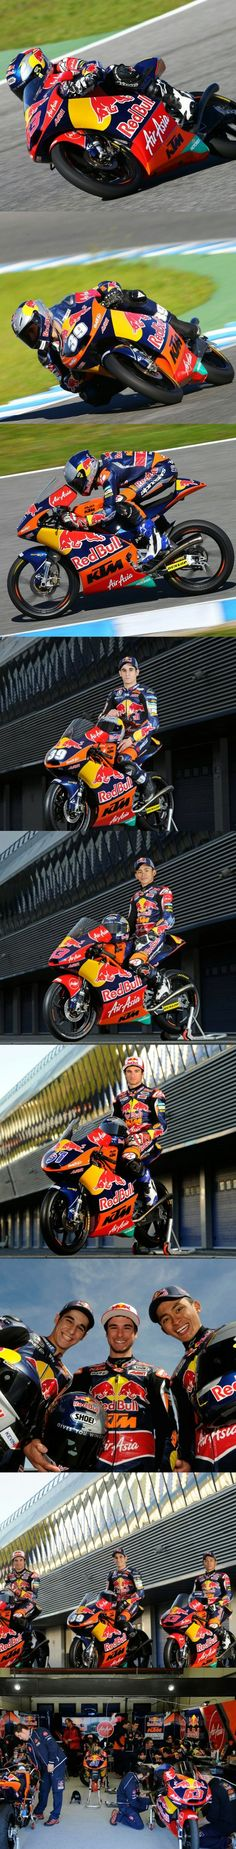 Red Bull Moto Grand Prix Tests 2013 #redbull #motogp